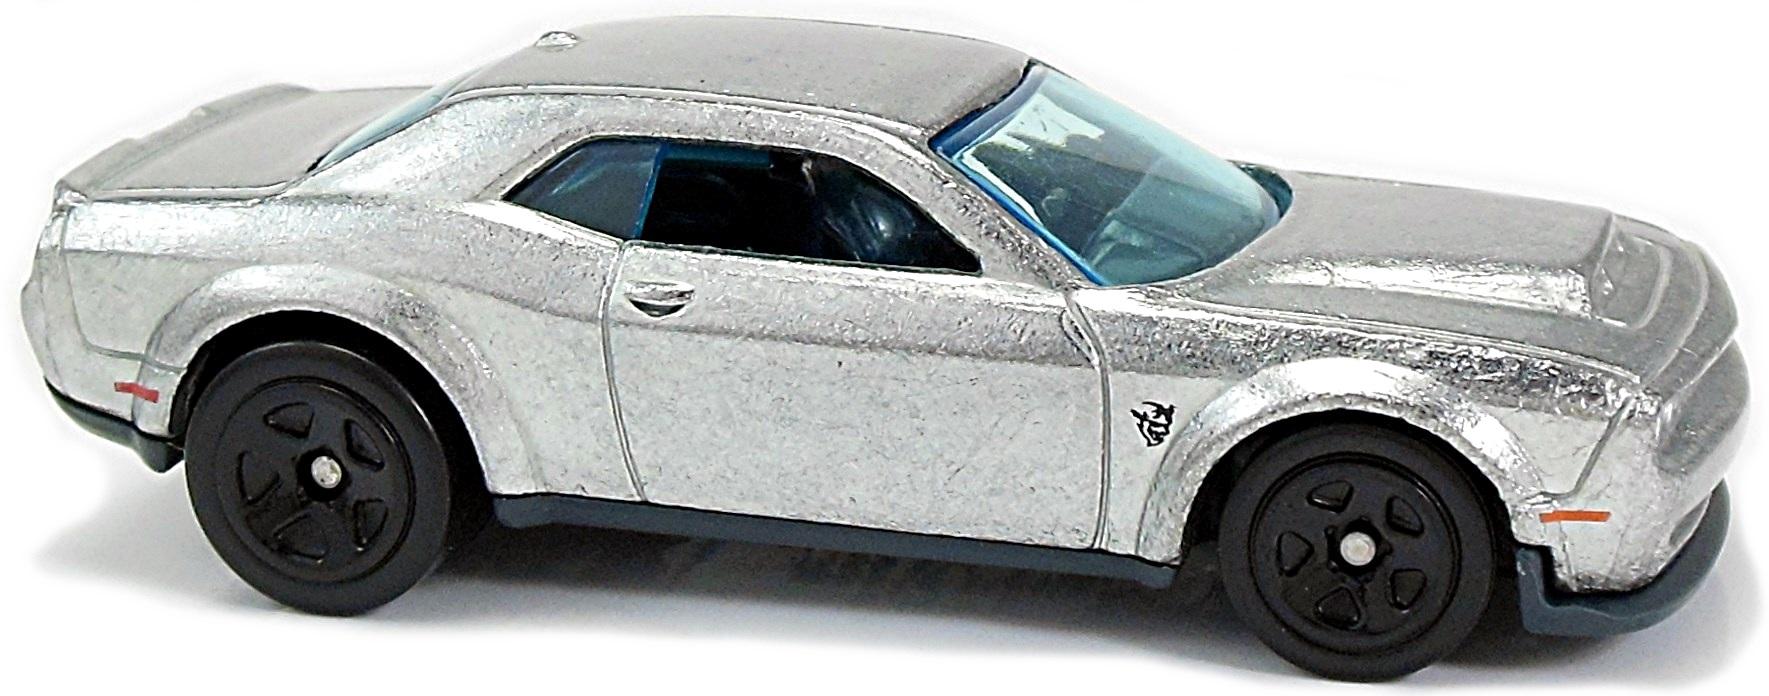 2018 Hot Wheels #319 Factory Fresh /'18 Dodge Challenger SRT Demon